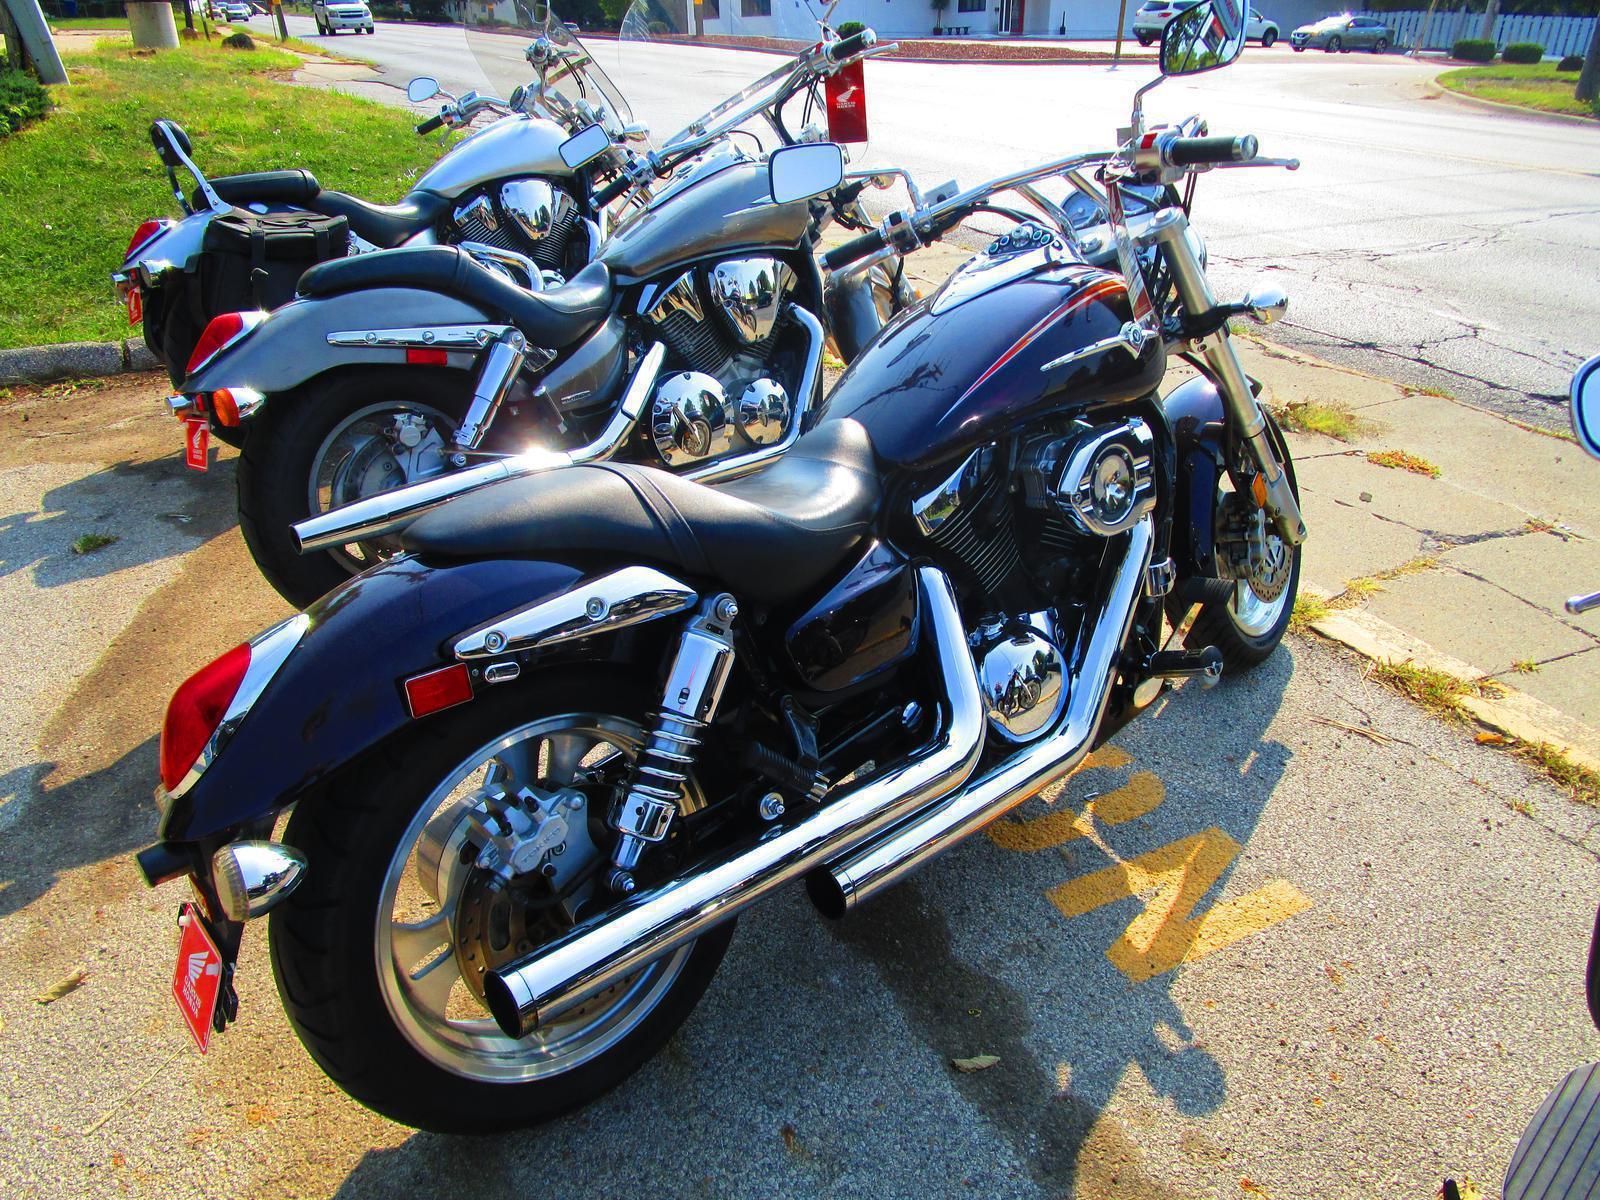 2003 Kawasaki Vulcan Mean Streak 1500 For Sale In Des Moines Ia